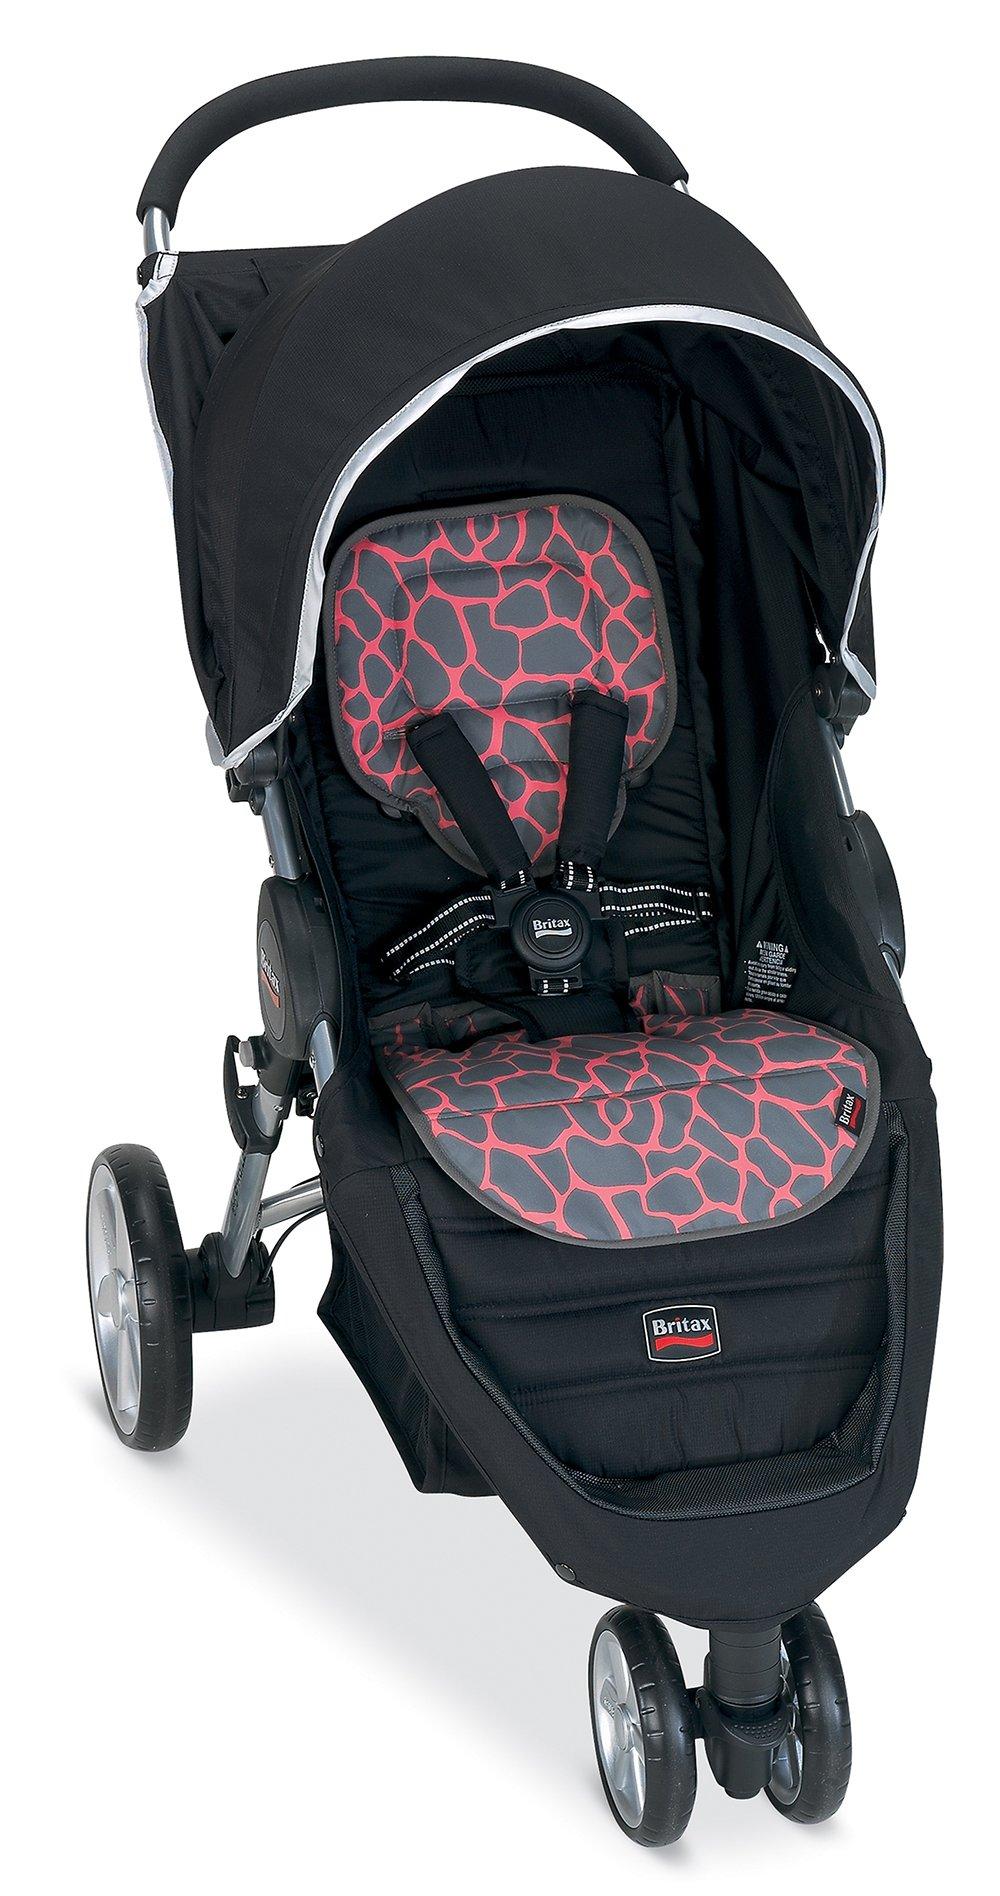 Britax B-Agile Fashion Stroller Kit, Pink Giraffe by Britax USA (Image #2)